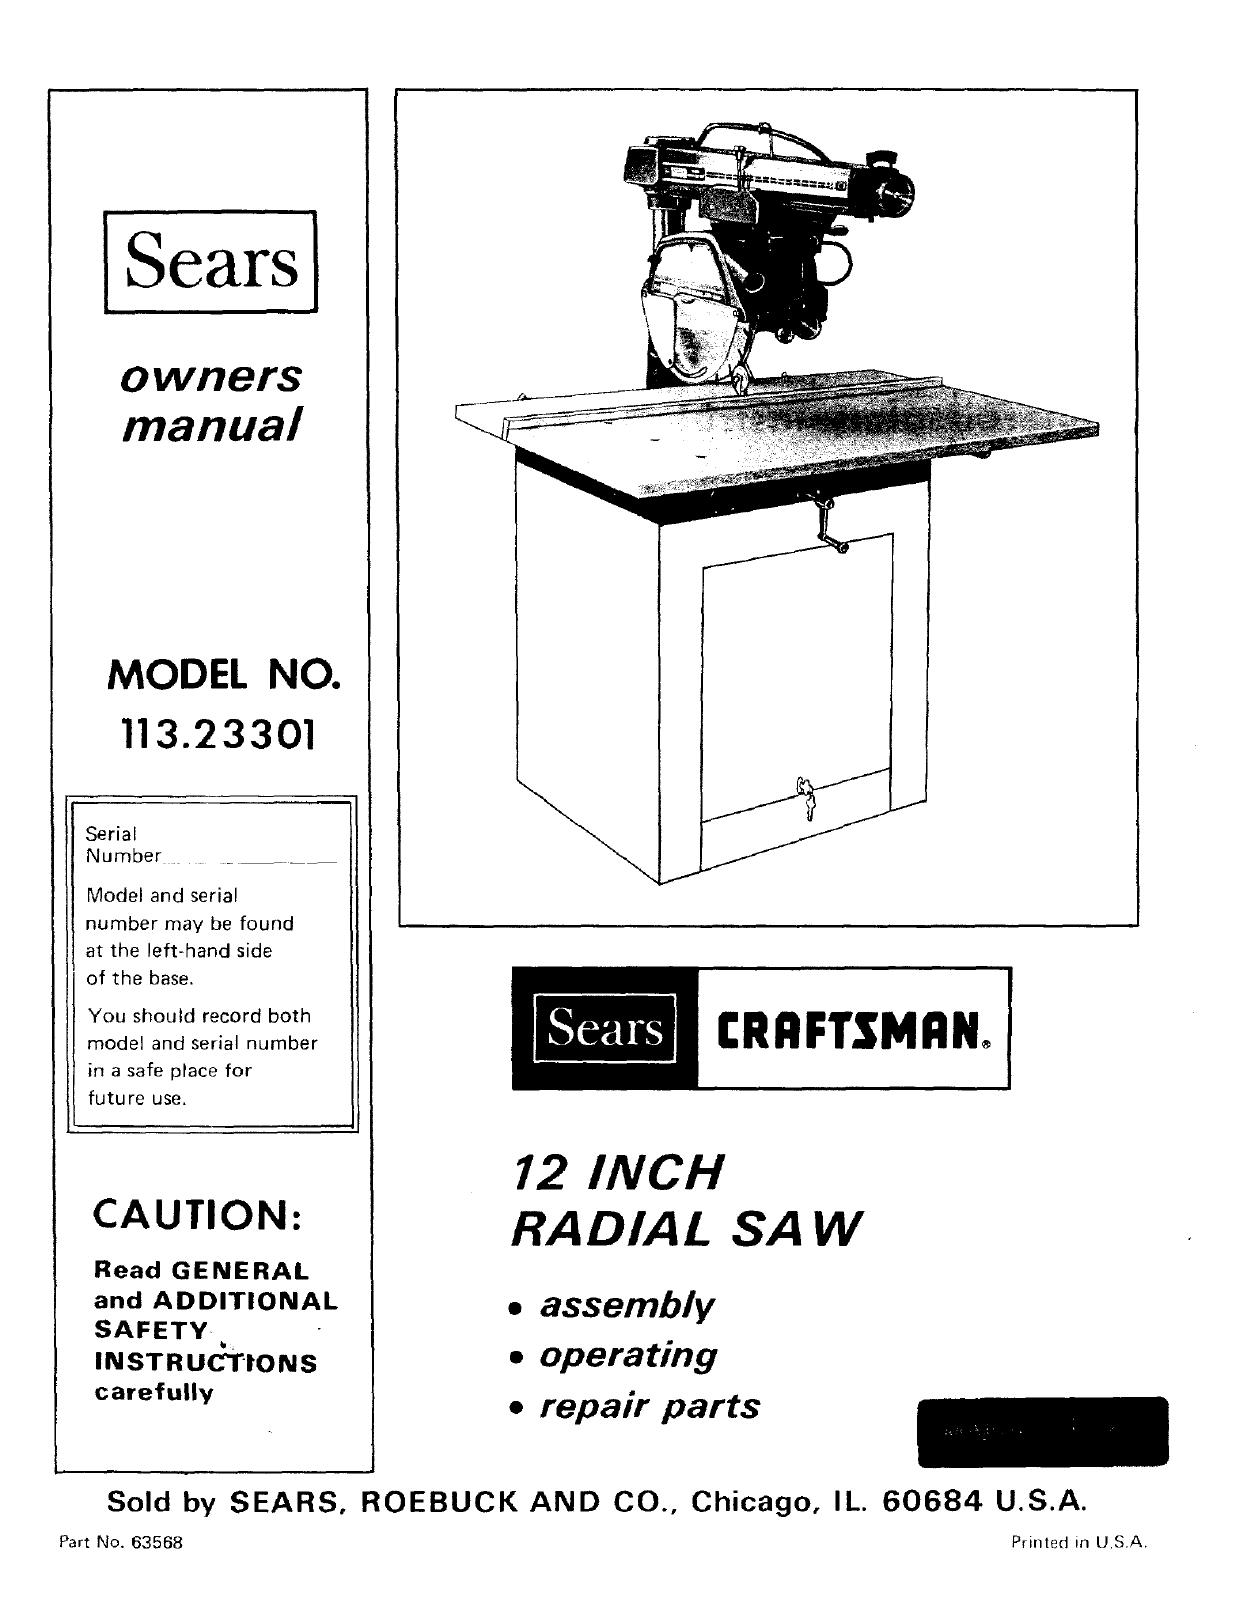 craftsman saw wiring diagram craftsman 11323301 user manual 12 in radial saw manuals and guides  user manual 12 in radial saw manuals